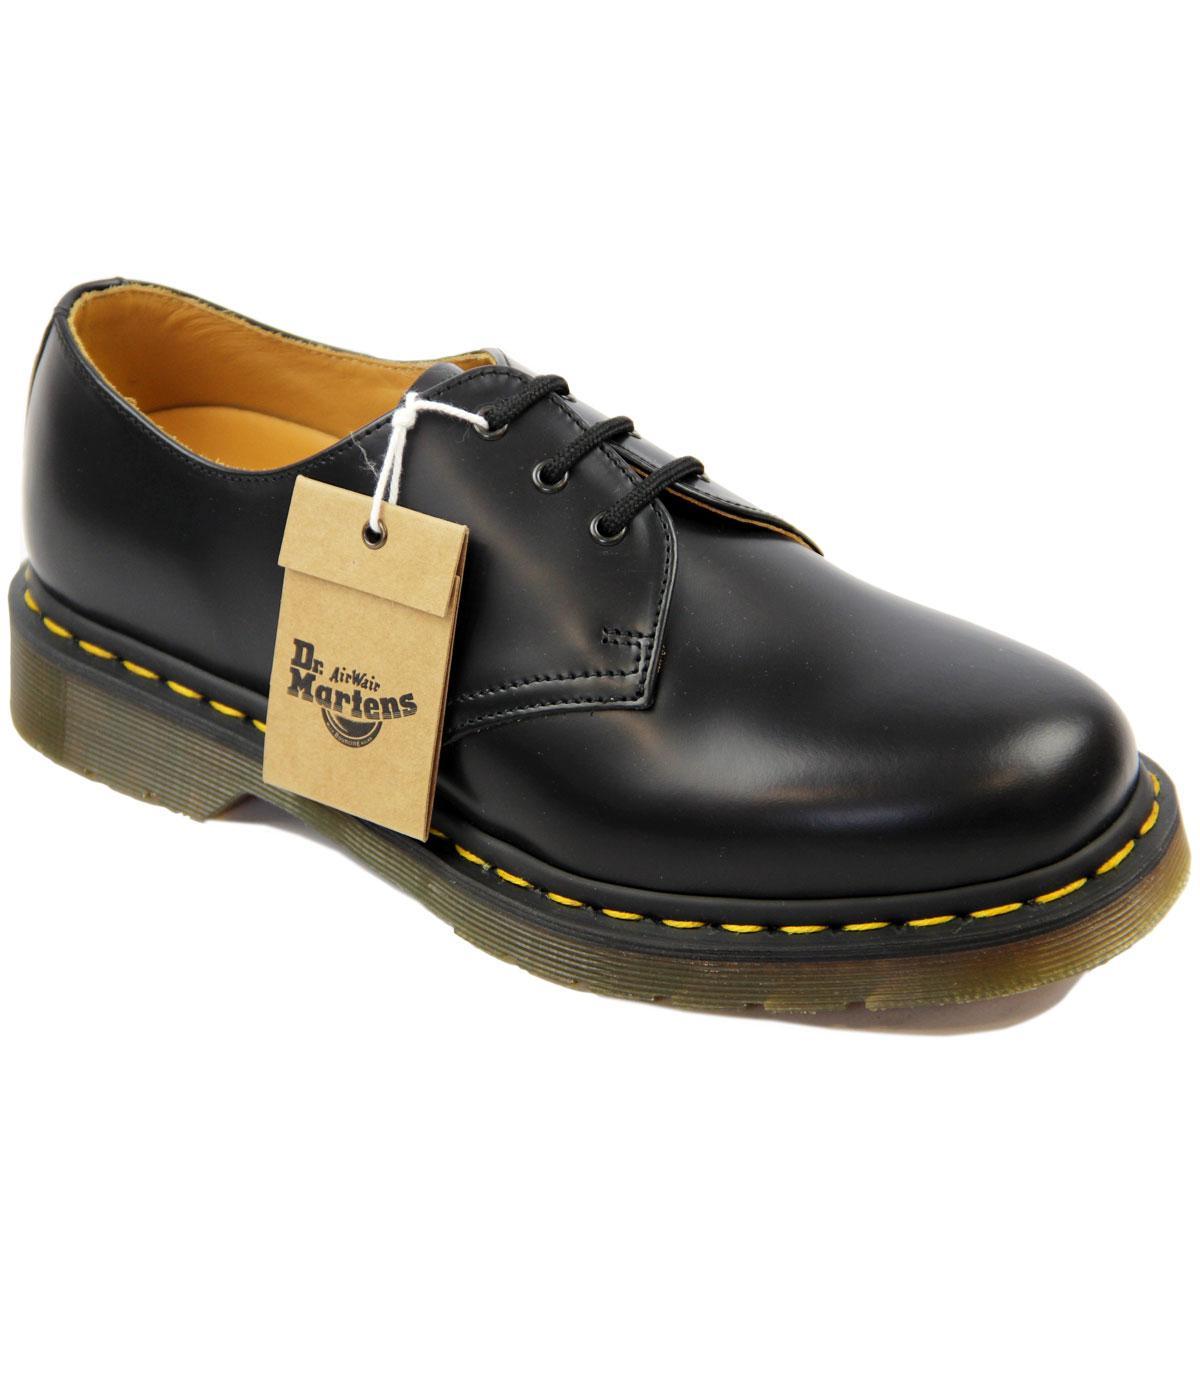 Dr Martens 1461 Retro 60 s Black Leather Lace up Retro Shoes 63bbb8cd6813